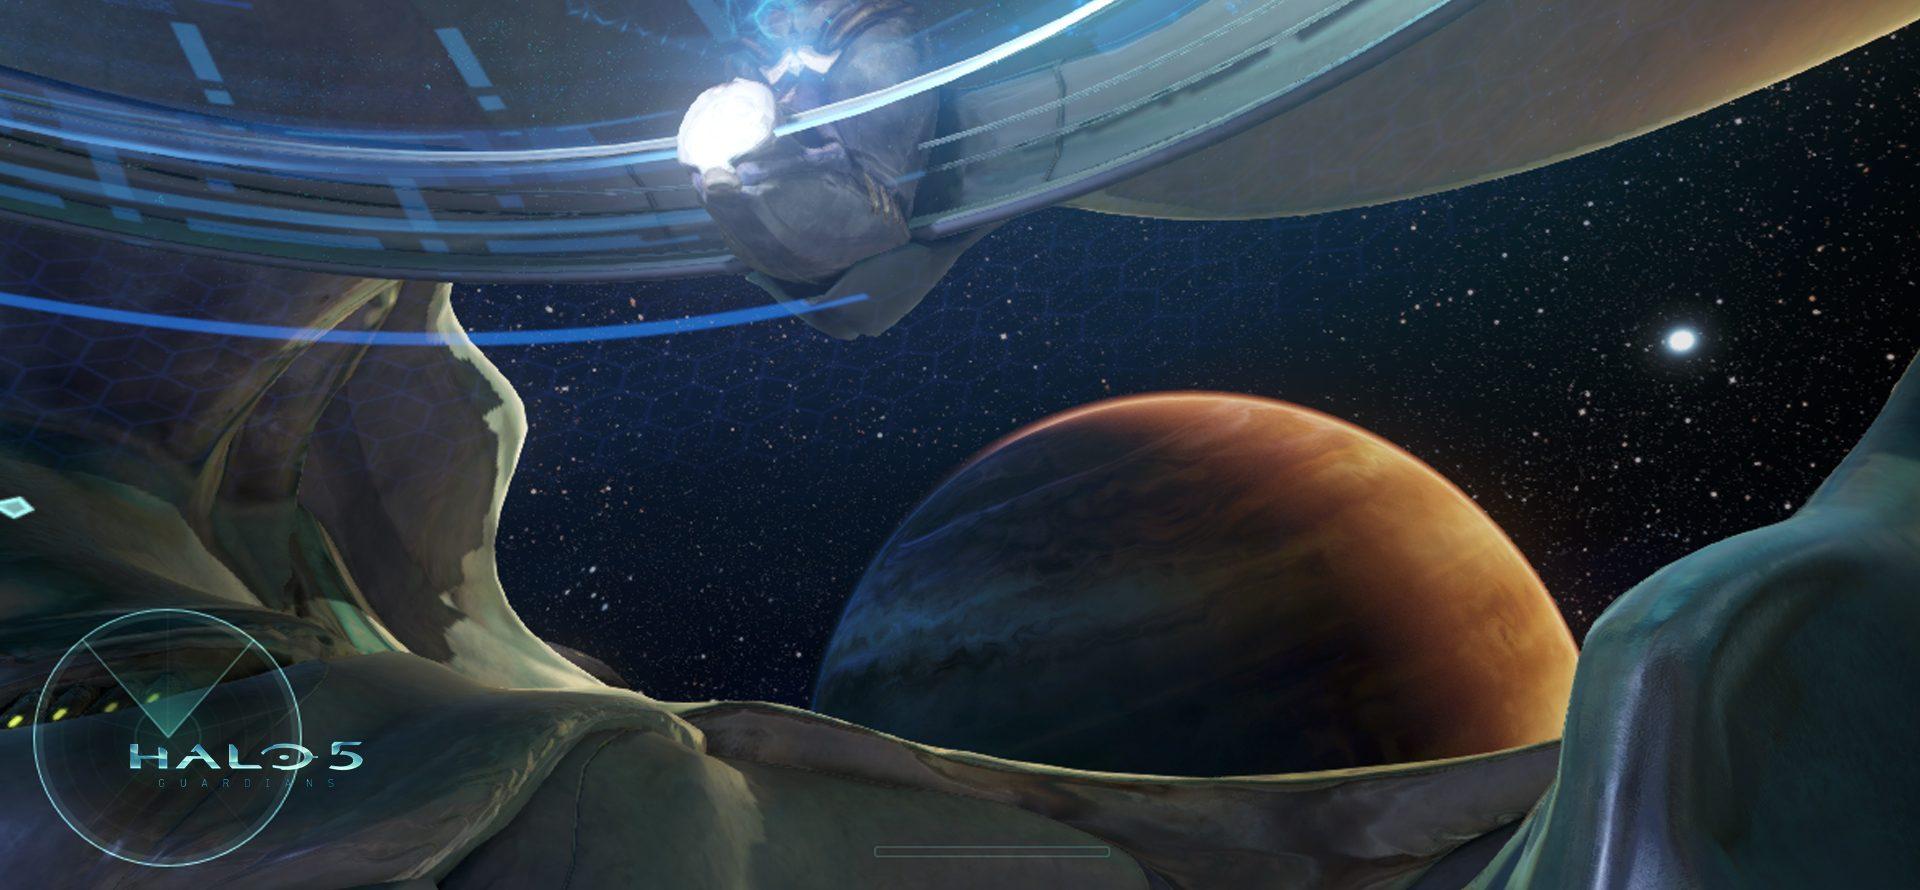 Halo 5 : Guardians – Planetside Software